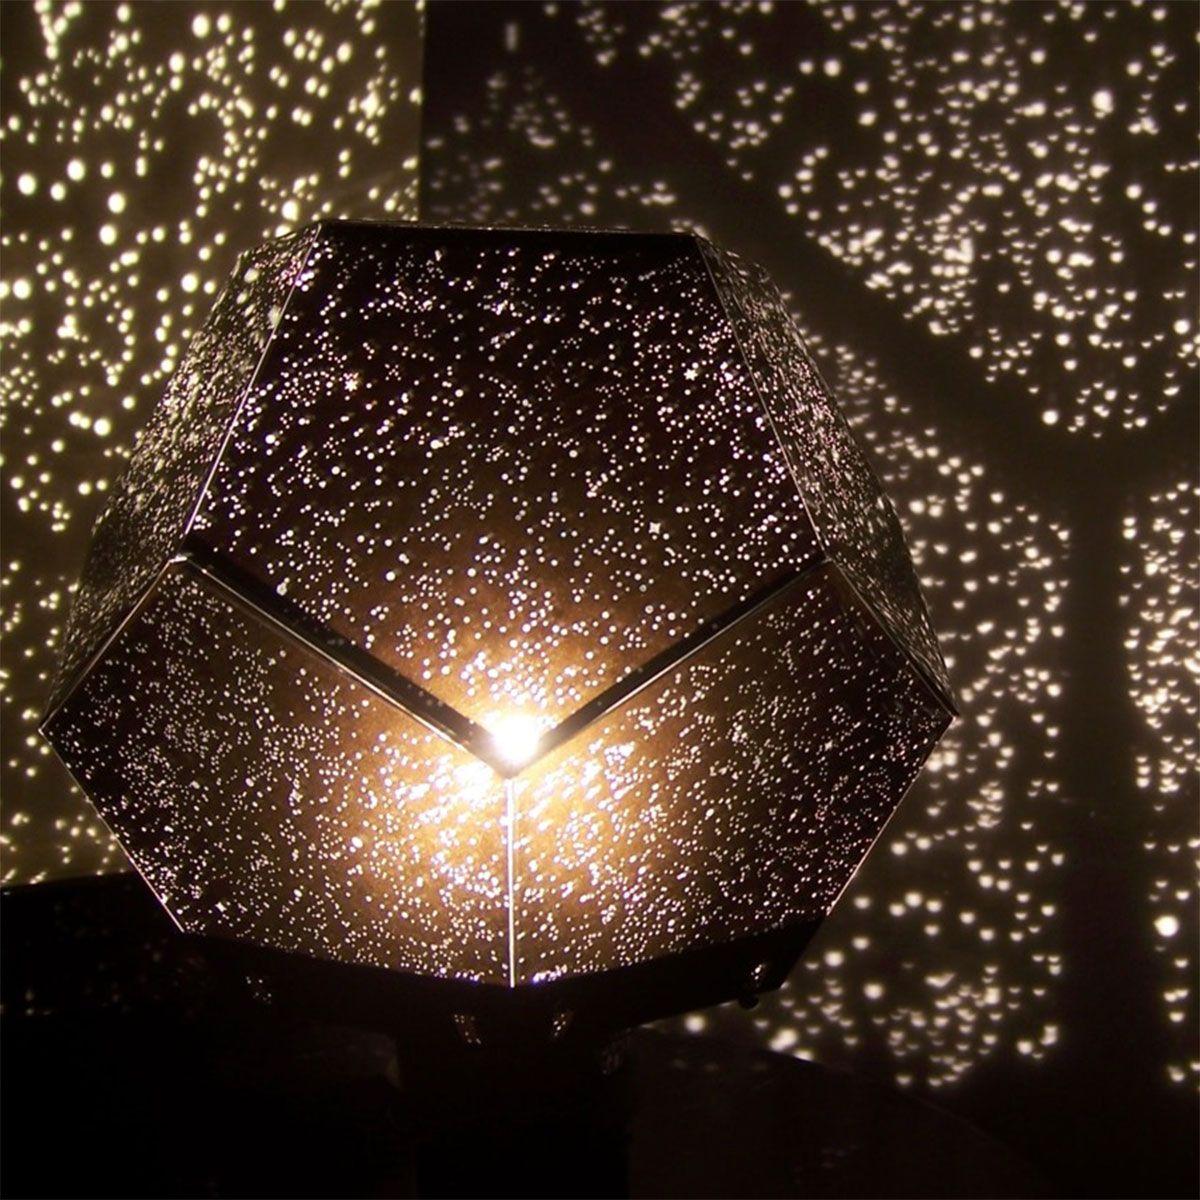 Sternenhimmel Projektor Dein Eigener Diy Sternenhimmel